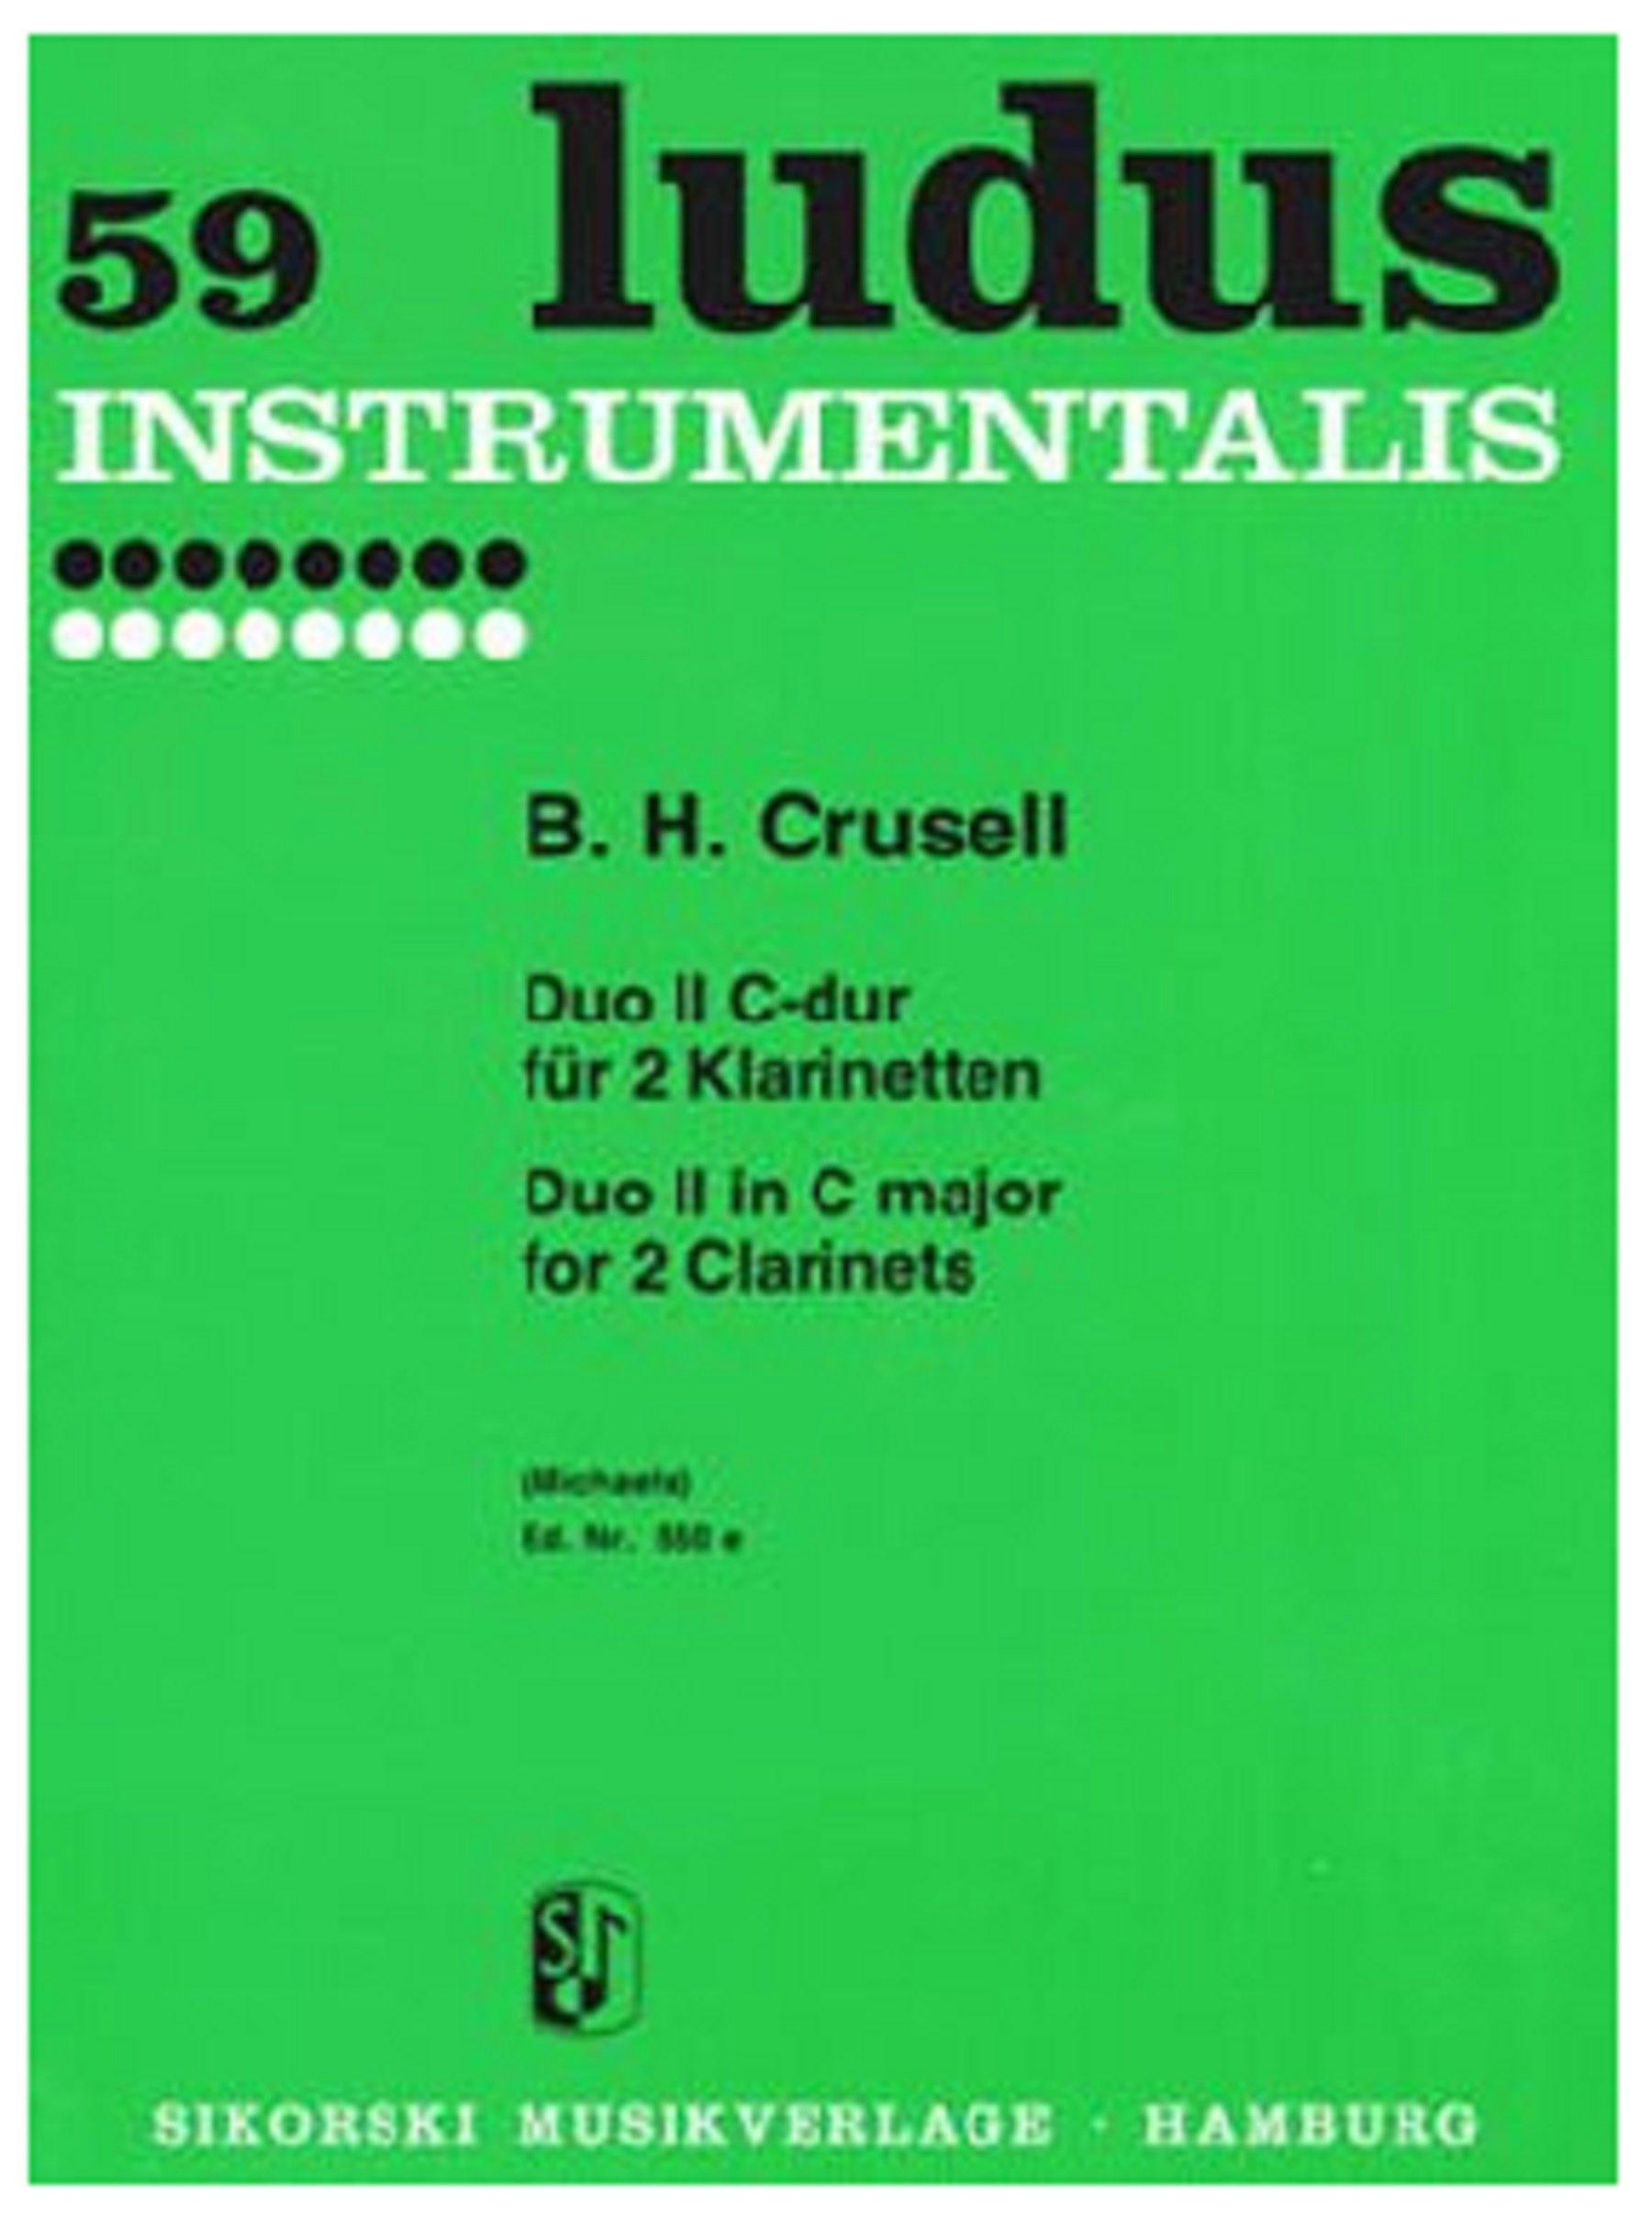 Duo-II-C-dur-fur-2-Klarinetten-Duo-II-in-C-for-2-Clarinets-Ludus-instrumental